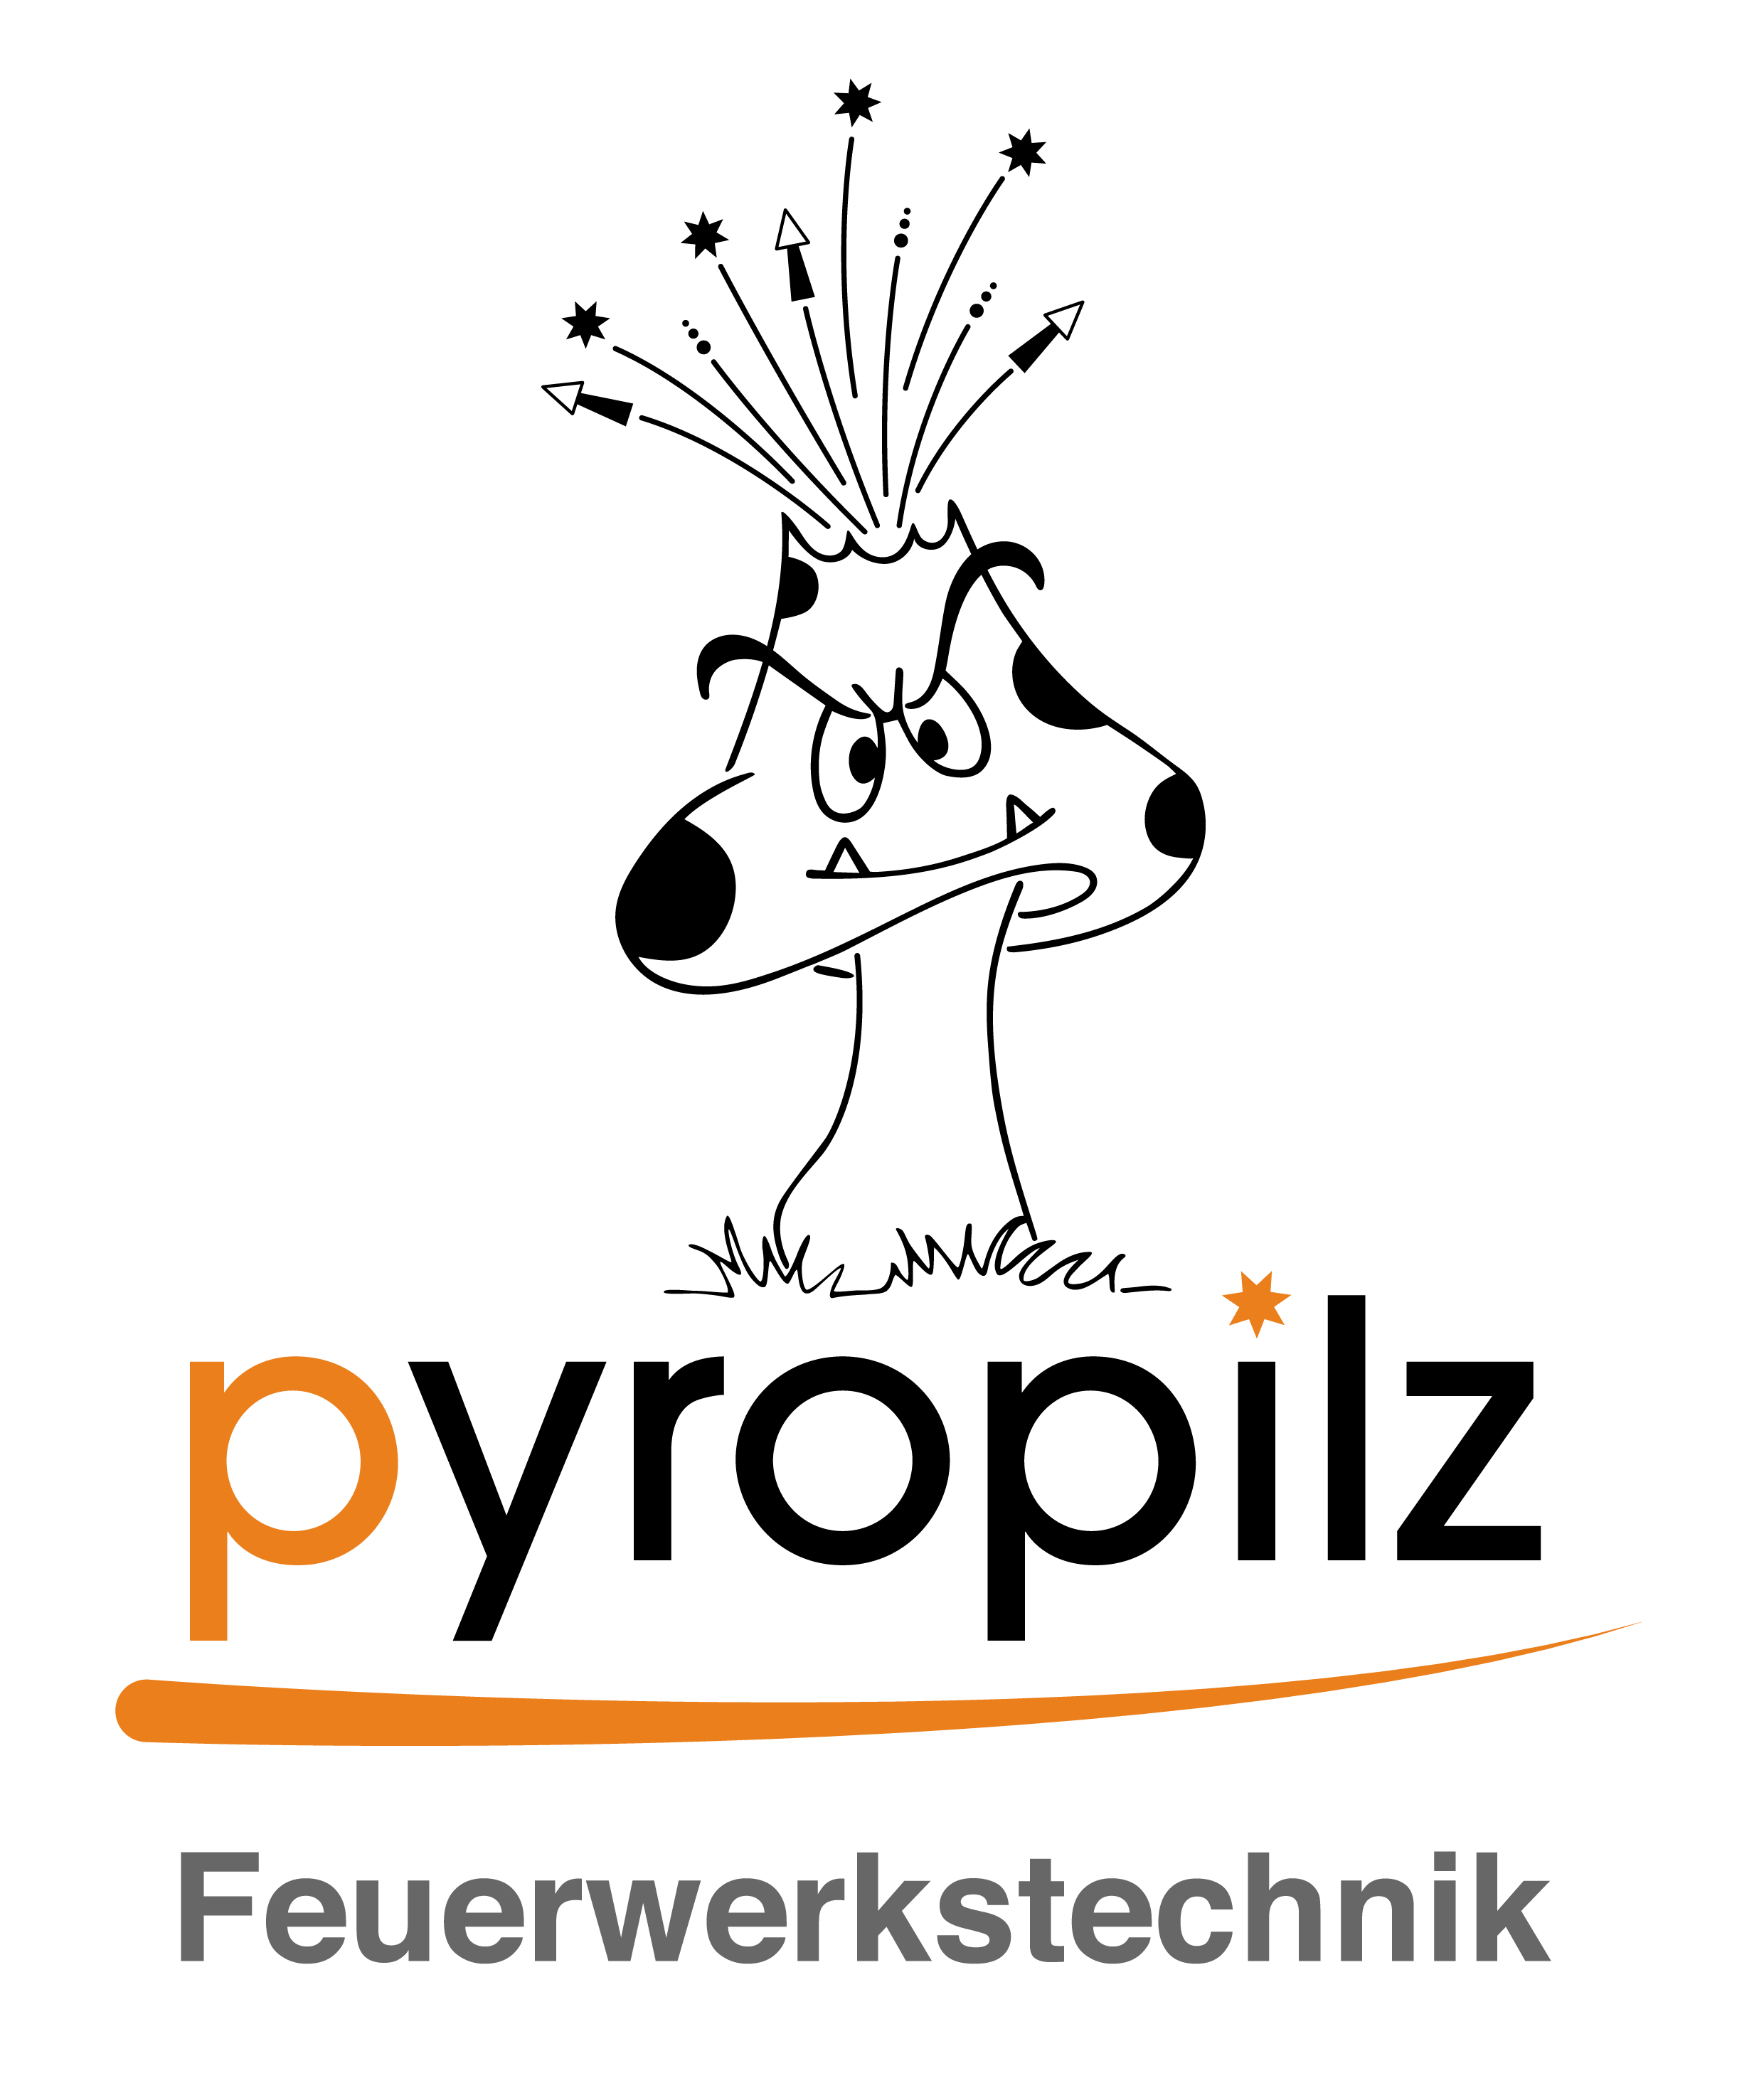 Pyropilz_Logo_Feuerwerkstechnik